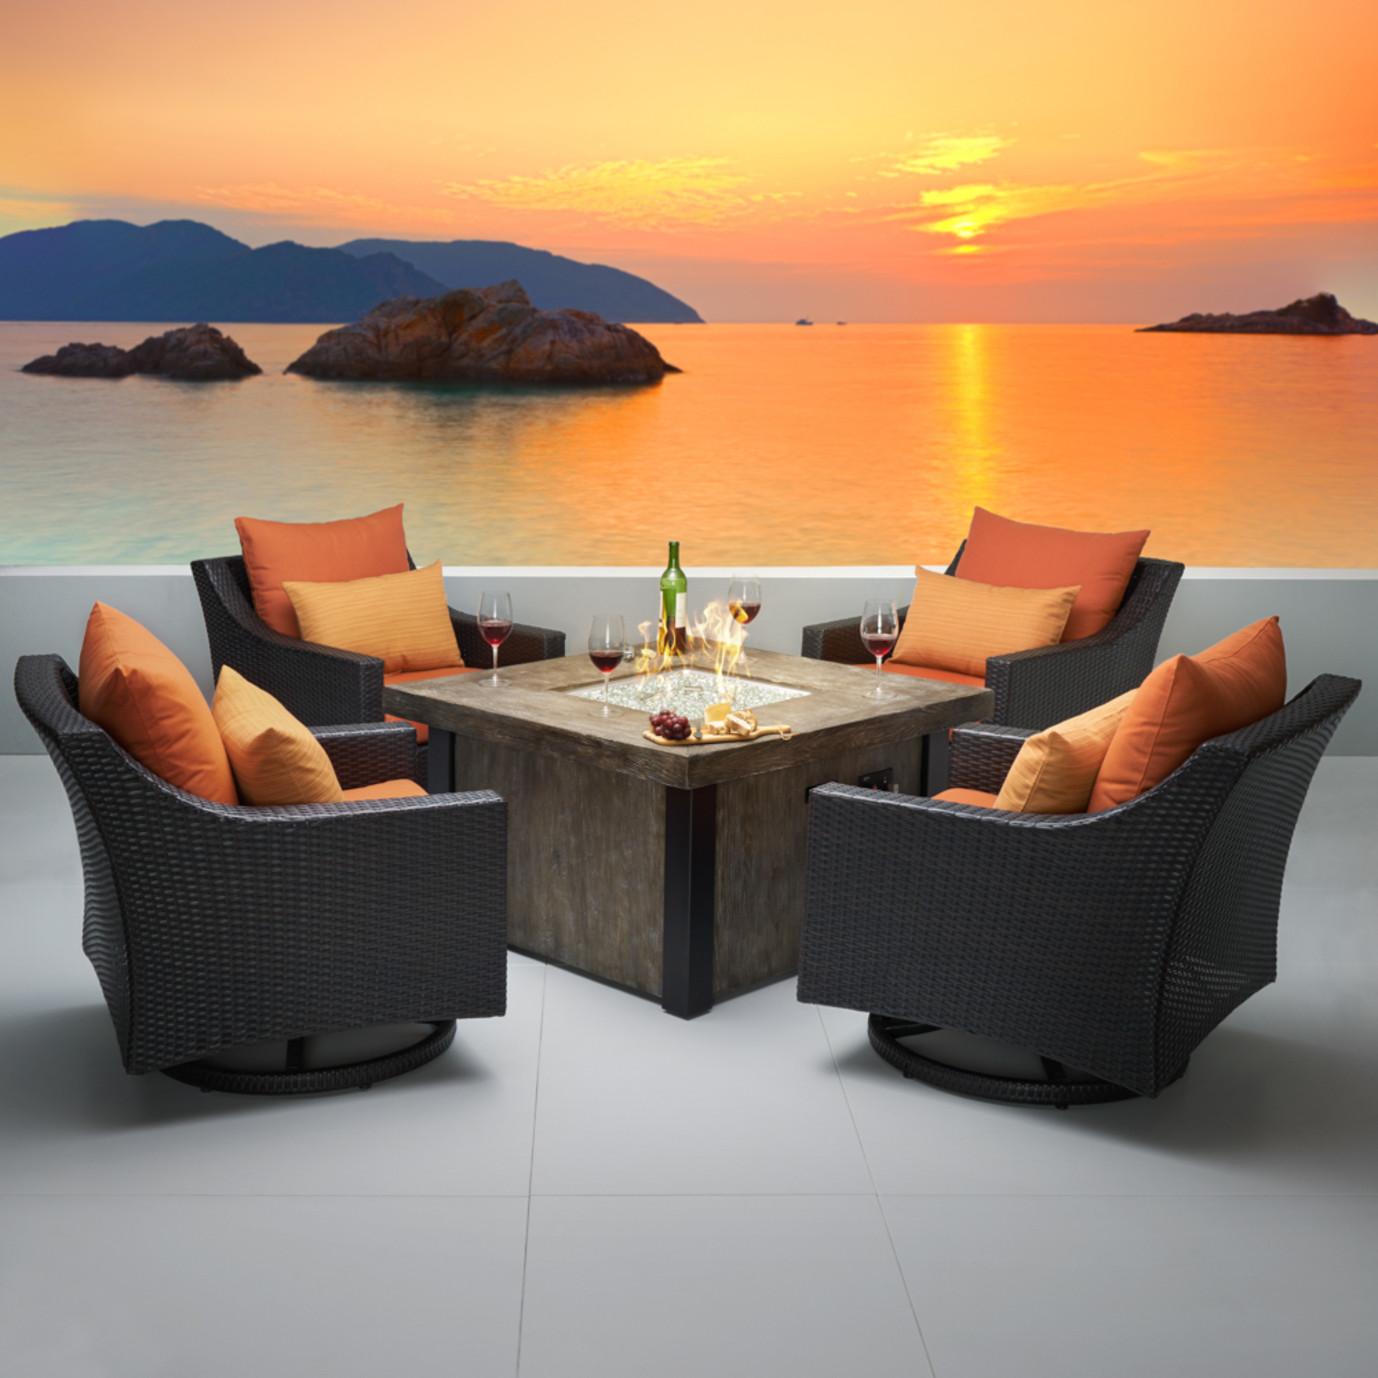 Deco™ 5 Piece Motion Fire Chat Set in Tikka Orange